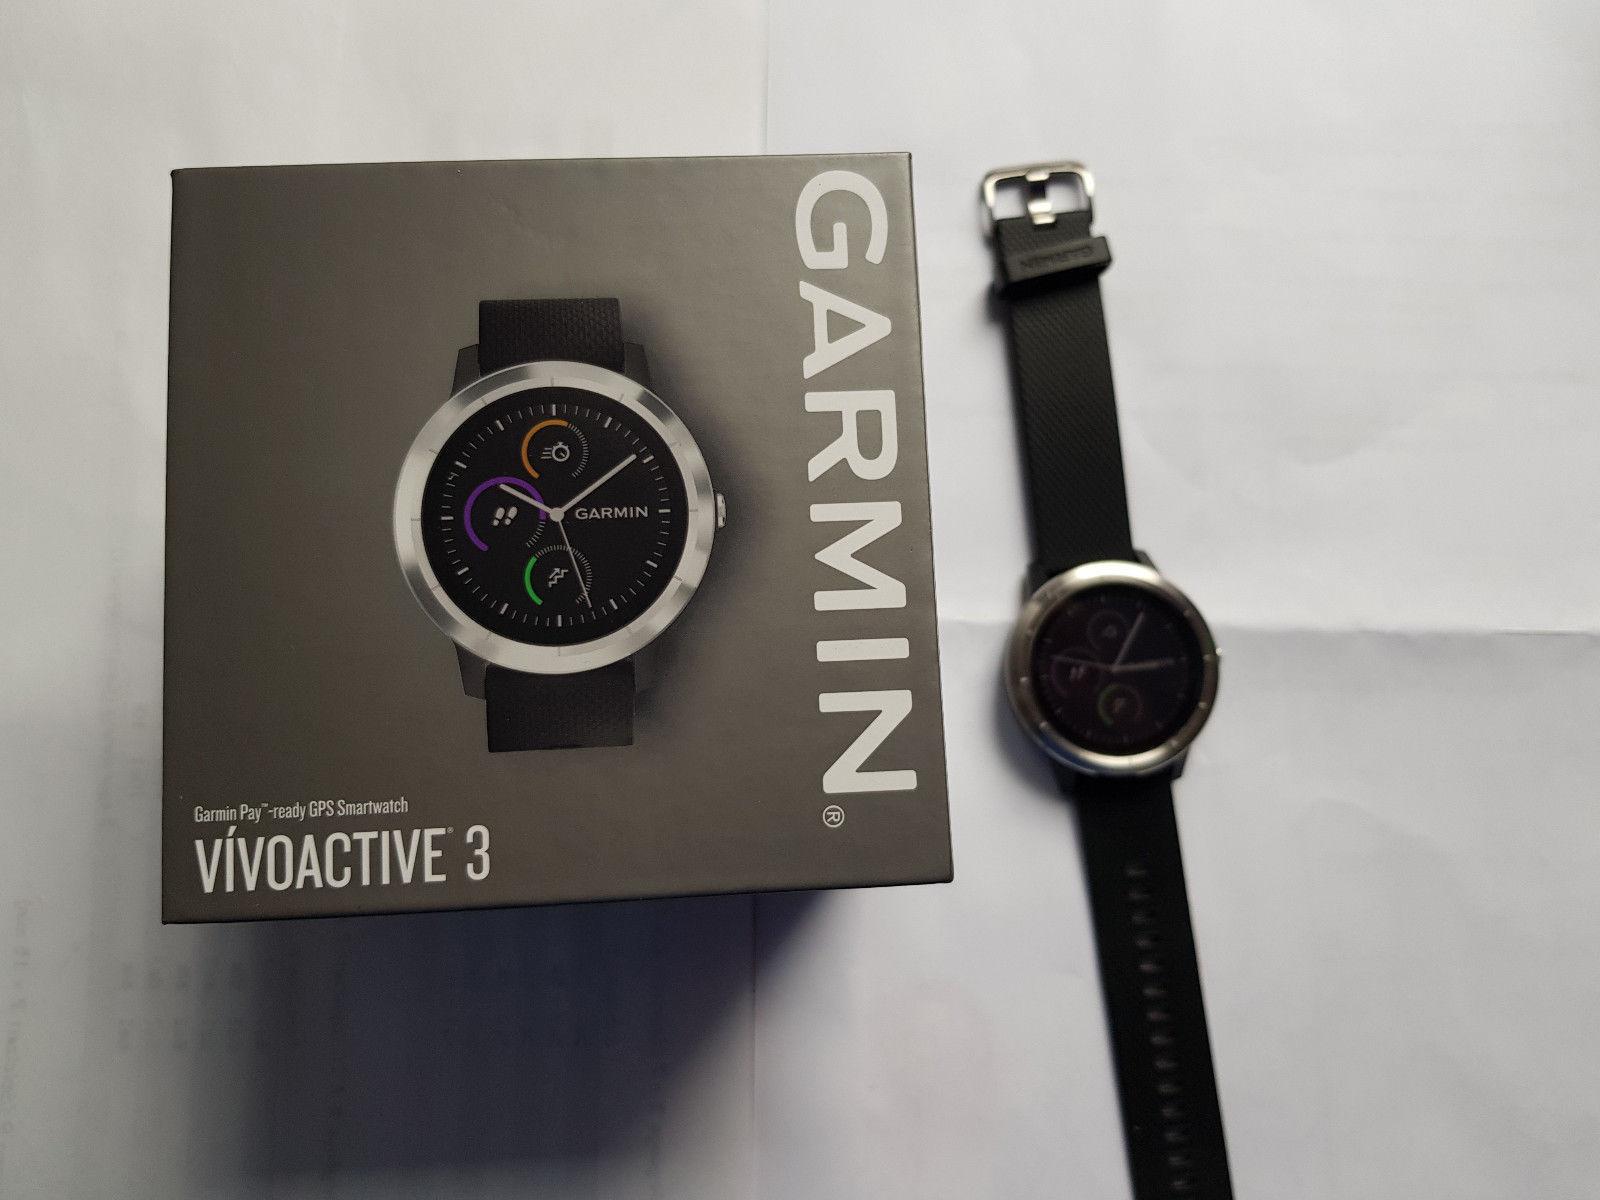 Garmin Vivoactive 3 Garmin Pay GPS Smartwatch Sportuhr Laufuhr Multisport